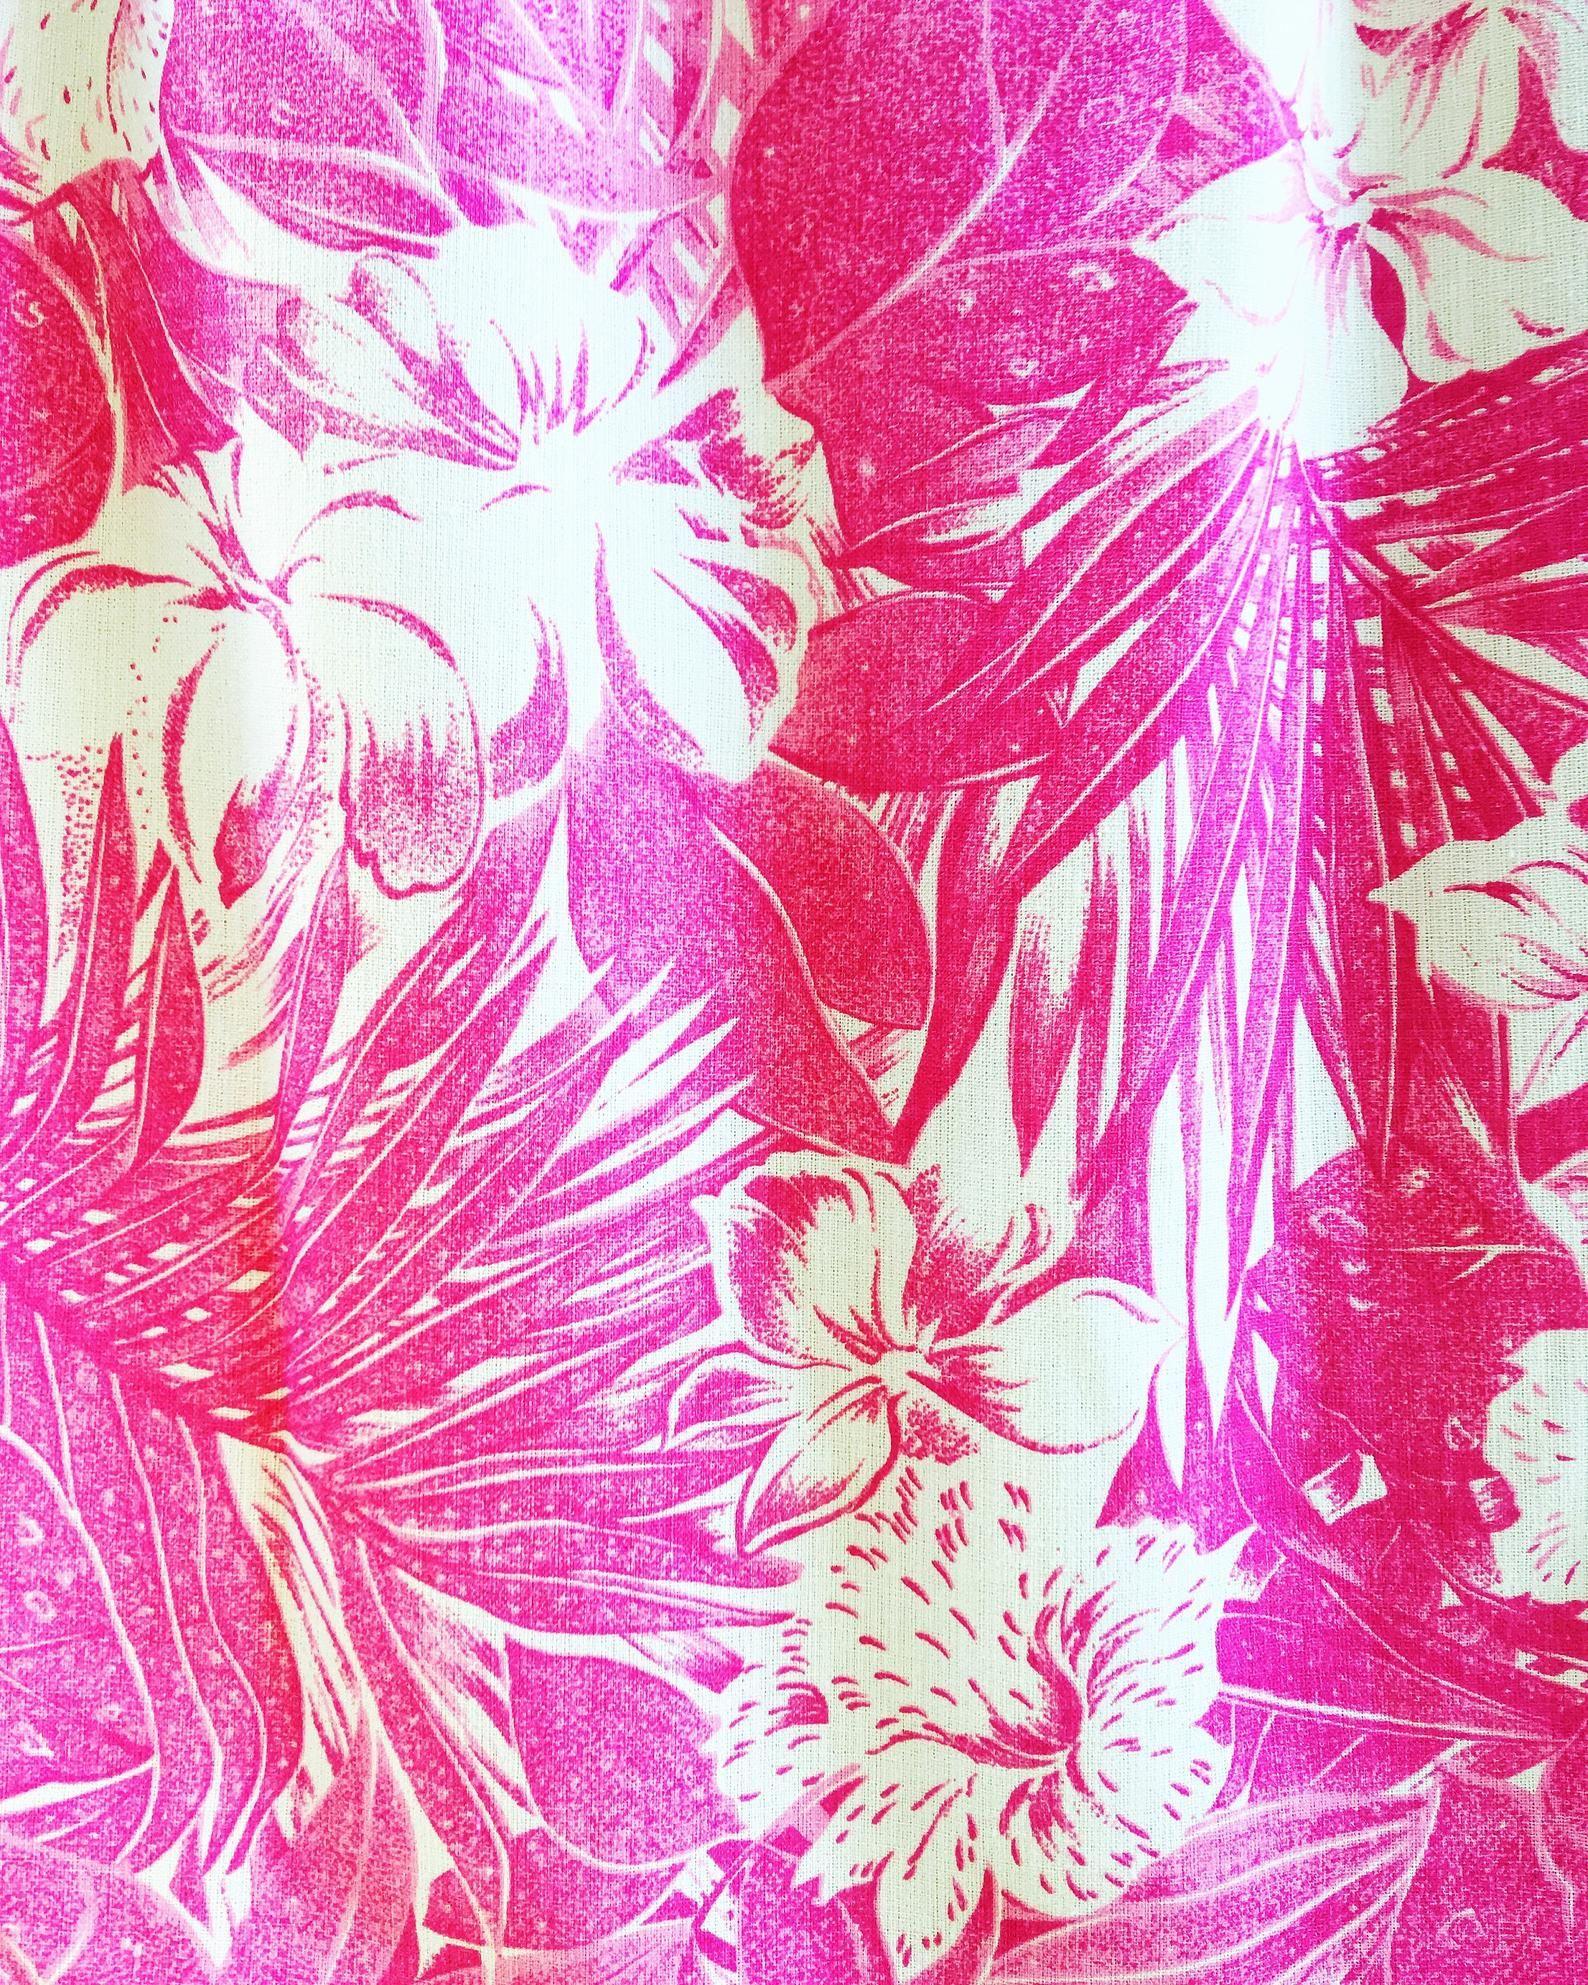 Pink Tropical Hawaiian Floral Print High Waist Skirt Retro Vintage